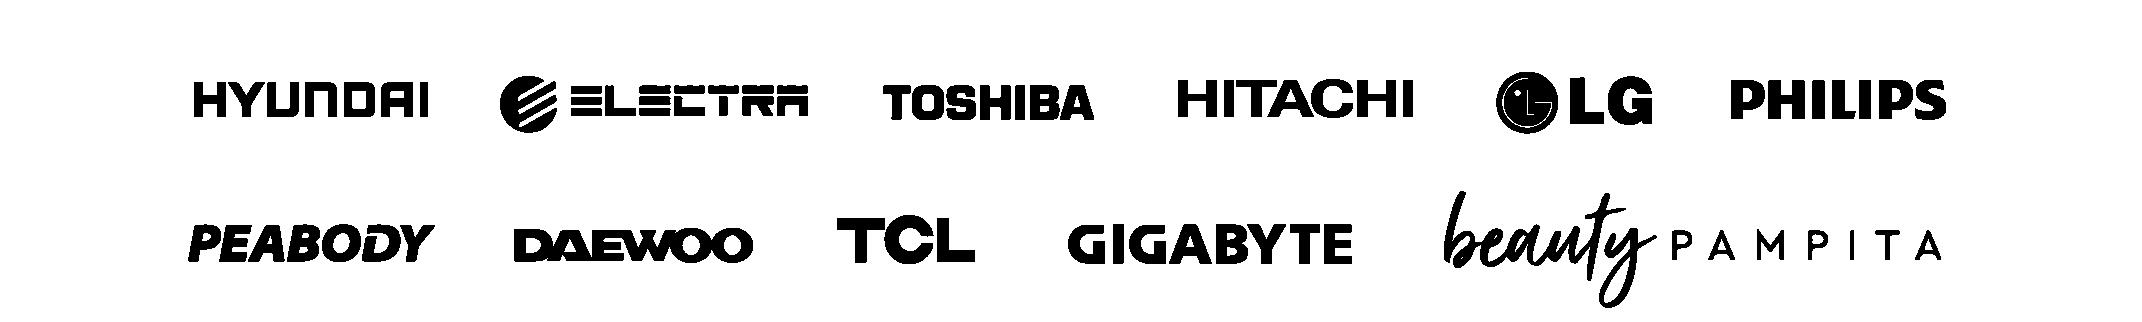 BANNERS WEB FIXON - 2-15